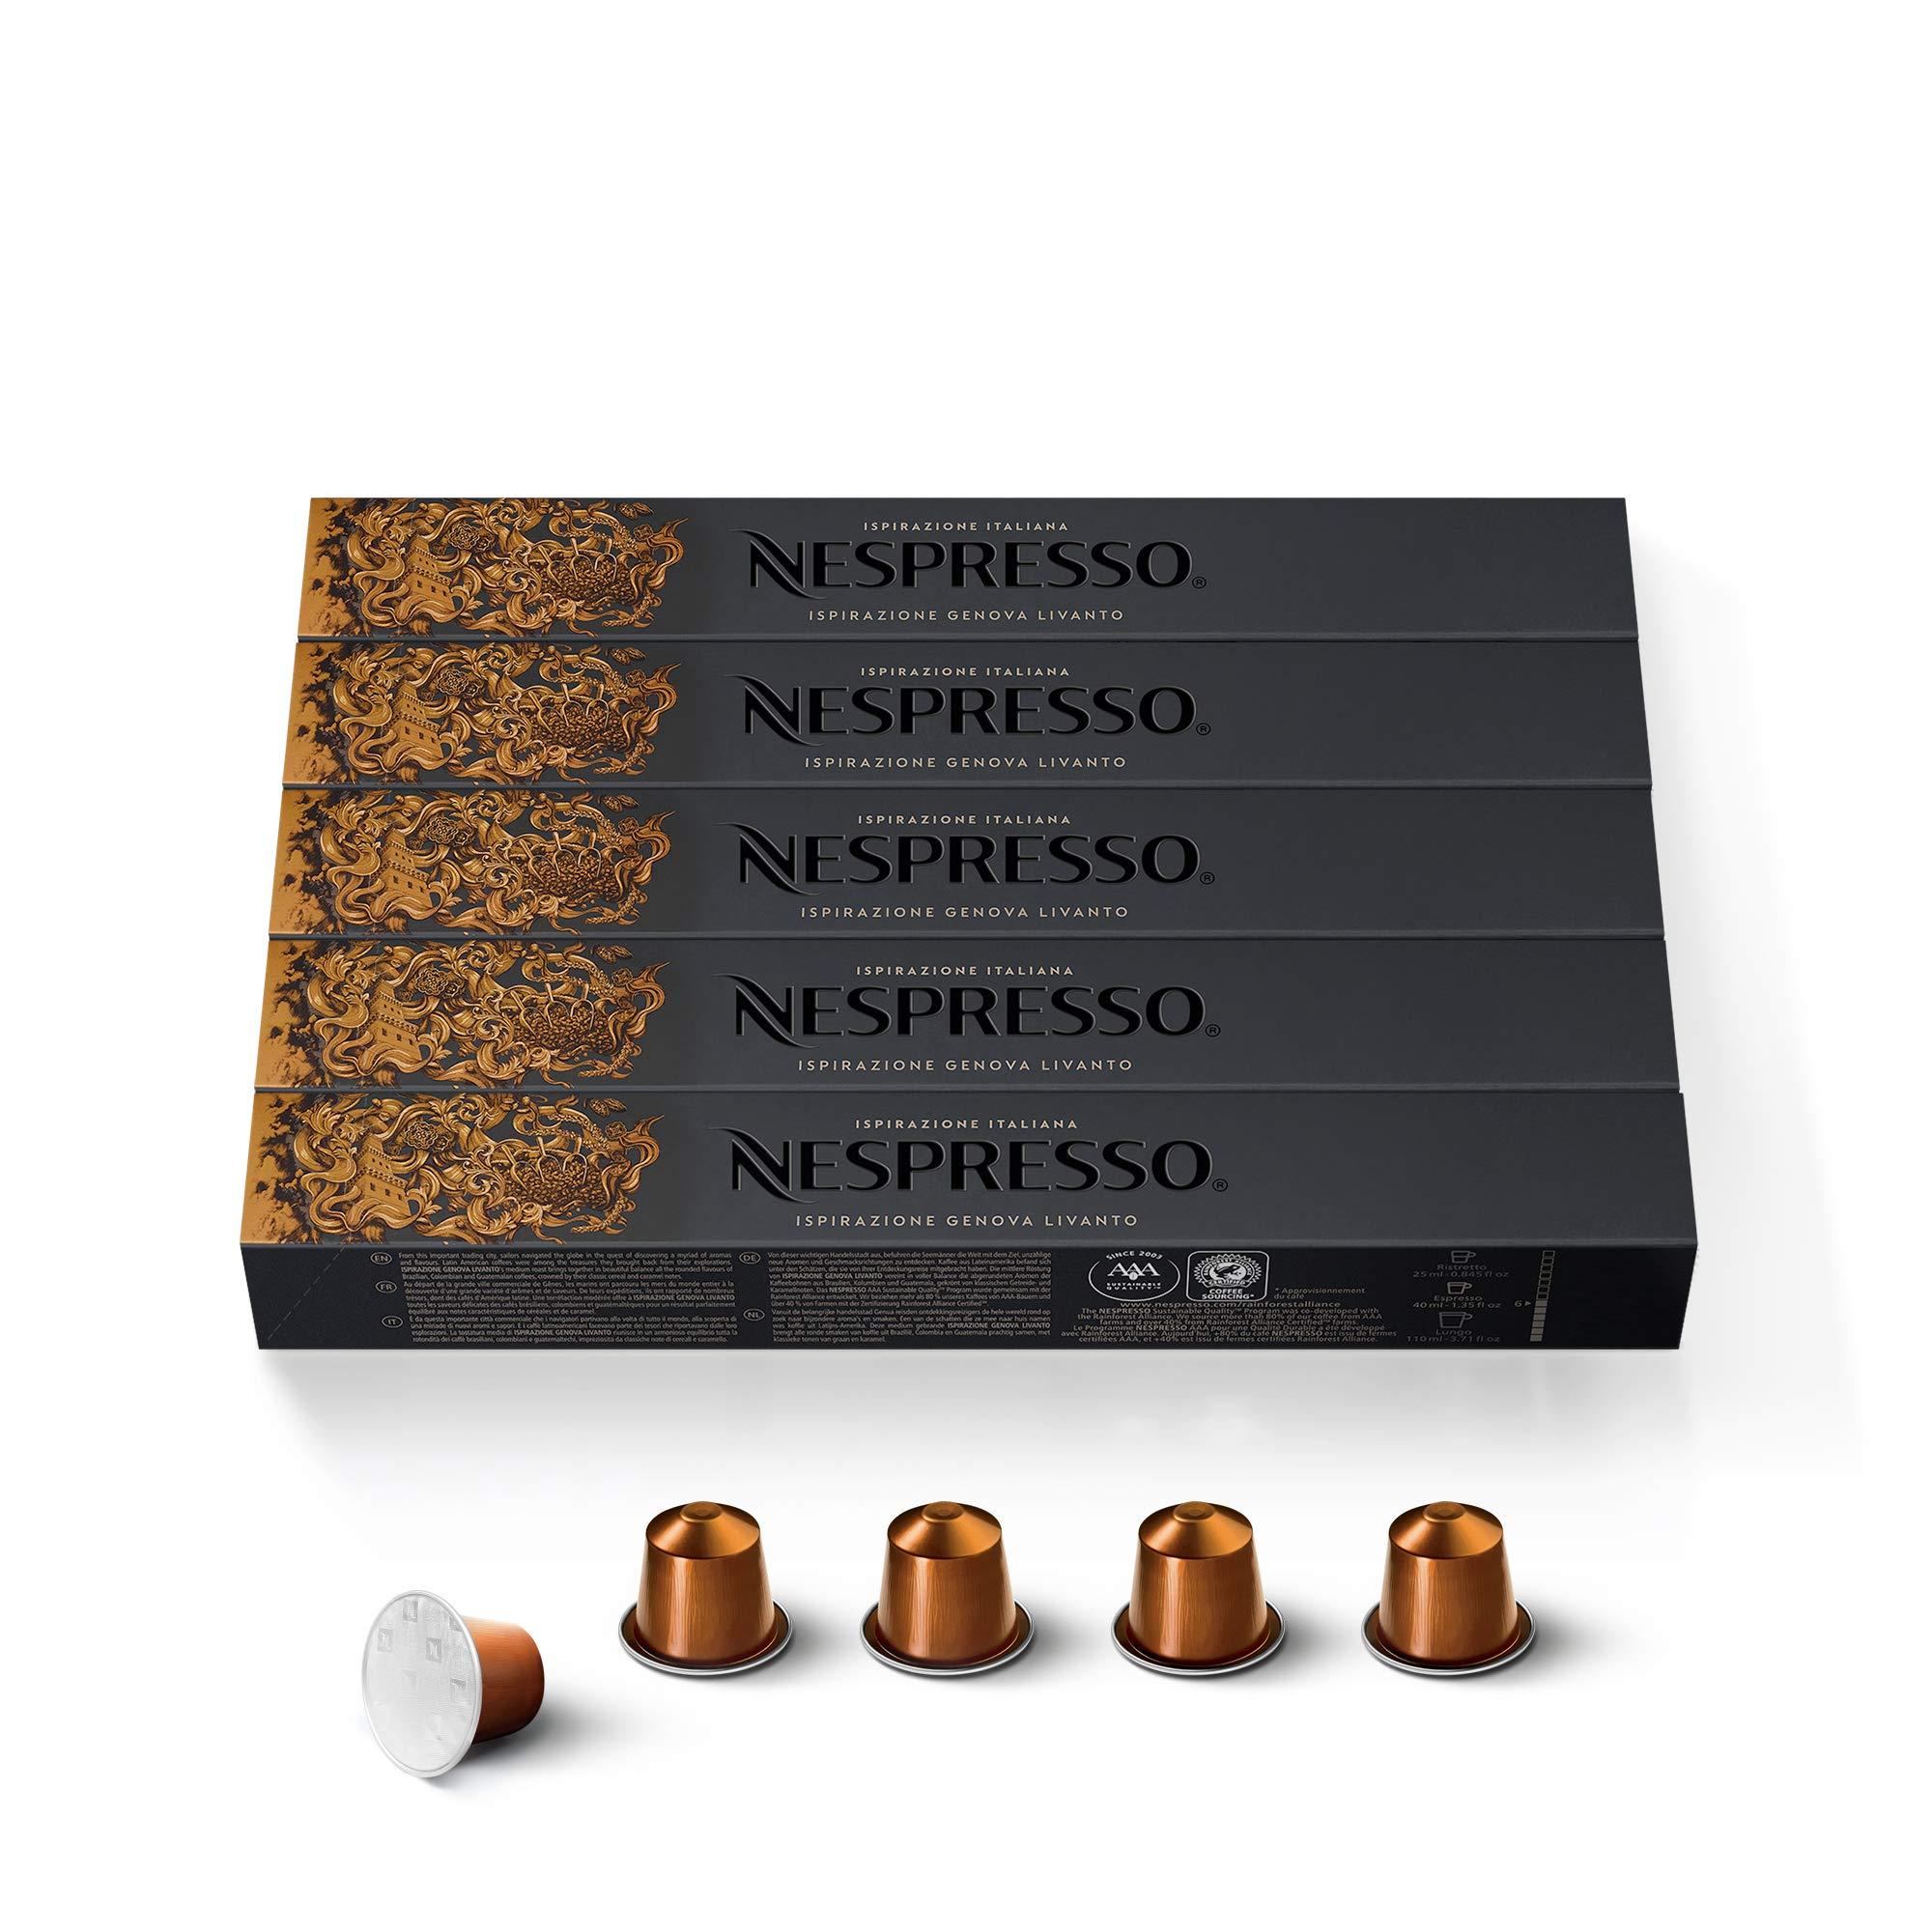 50 Nespresso Livanto Coffee Capsules …